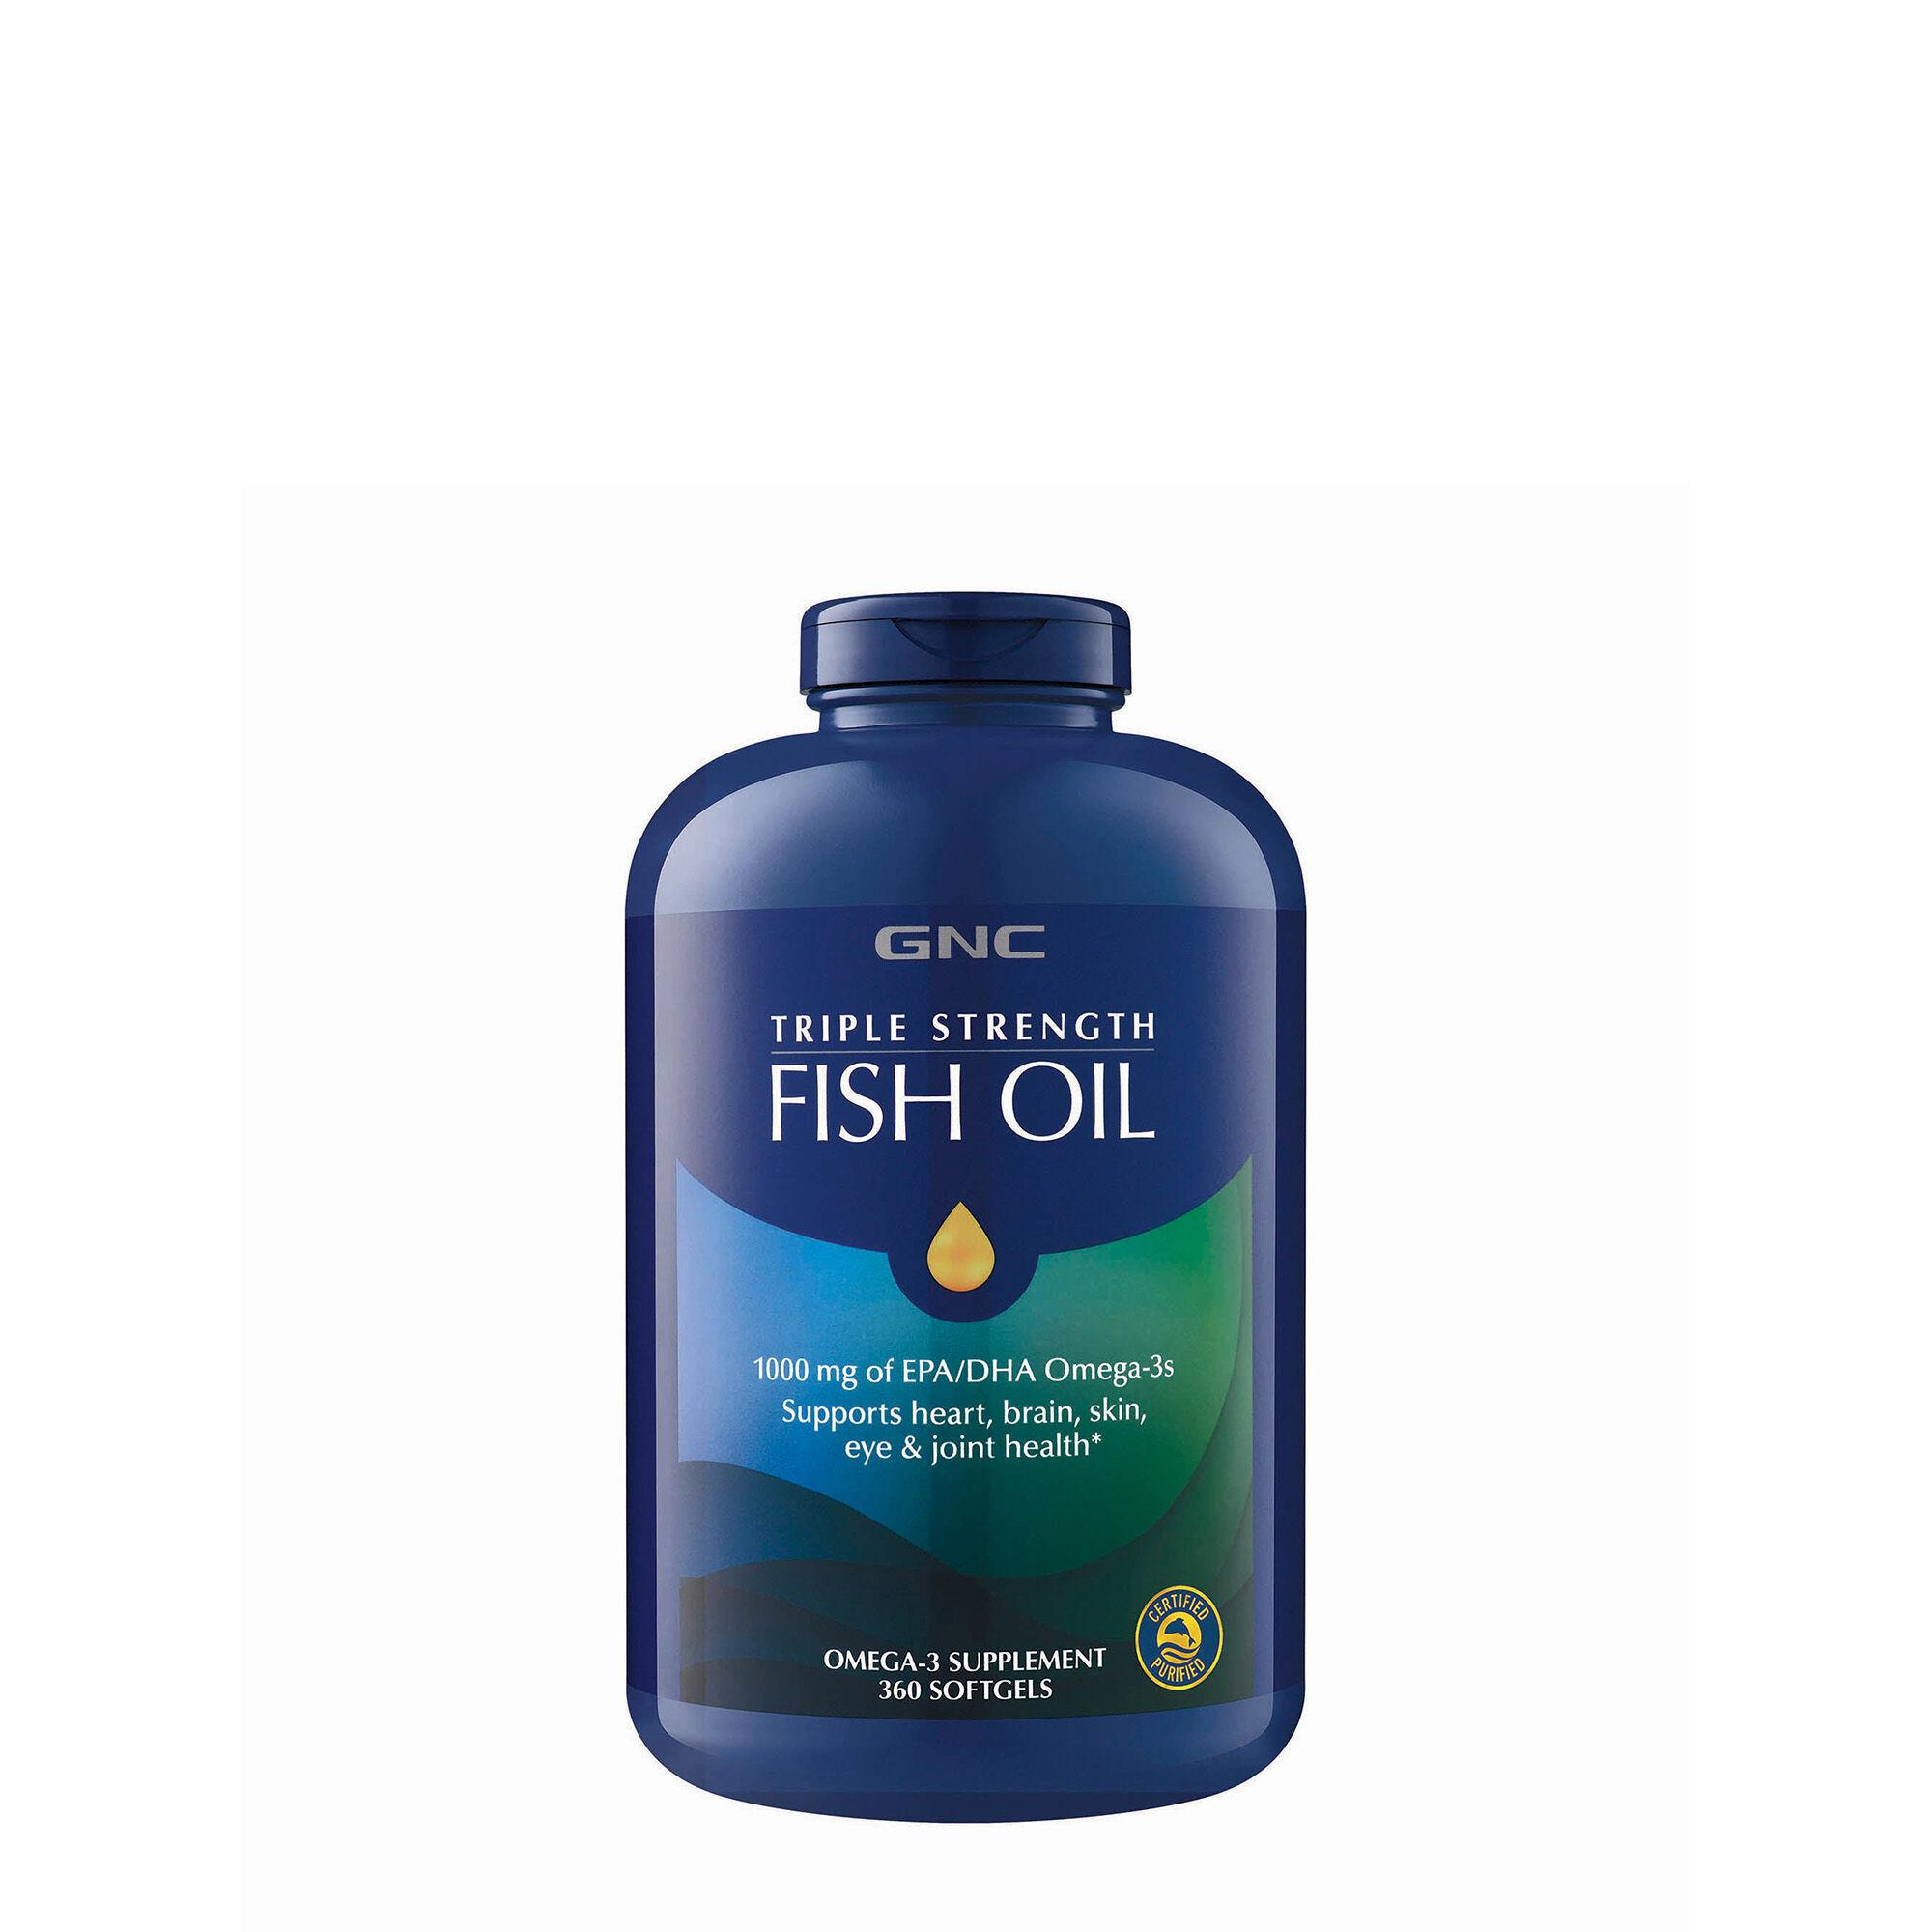 Gnc new testosterone booster foto bugil bokep 2017 for Fish oil testosterone